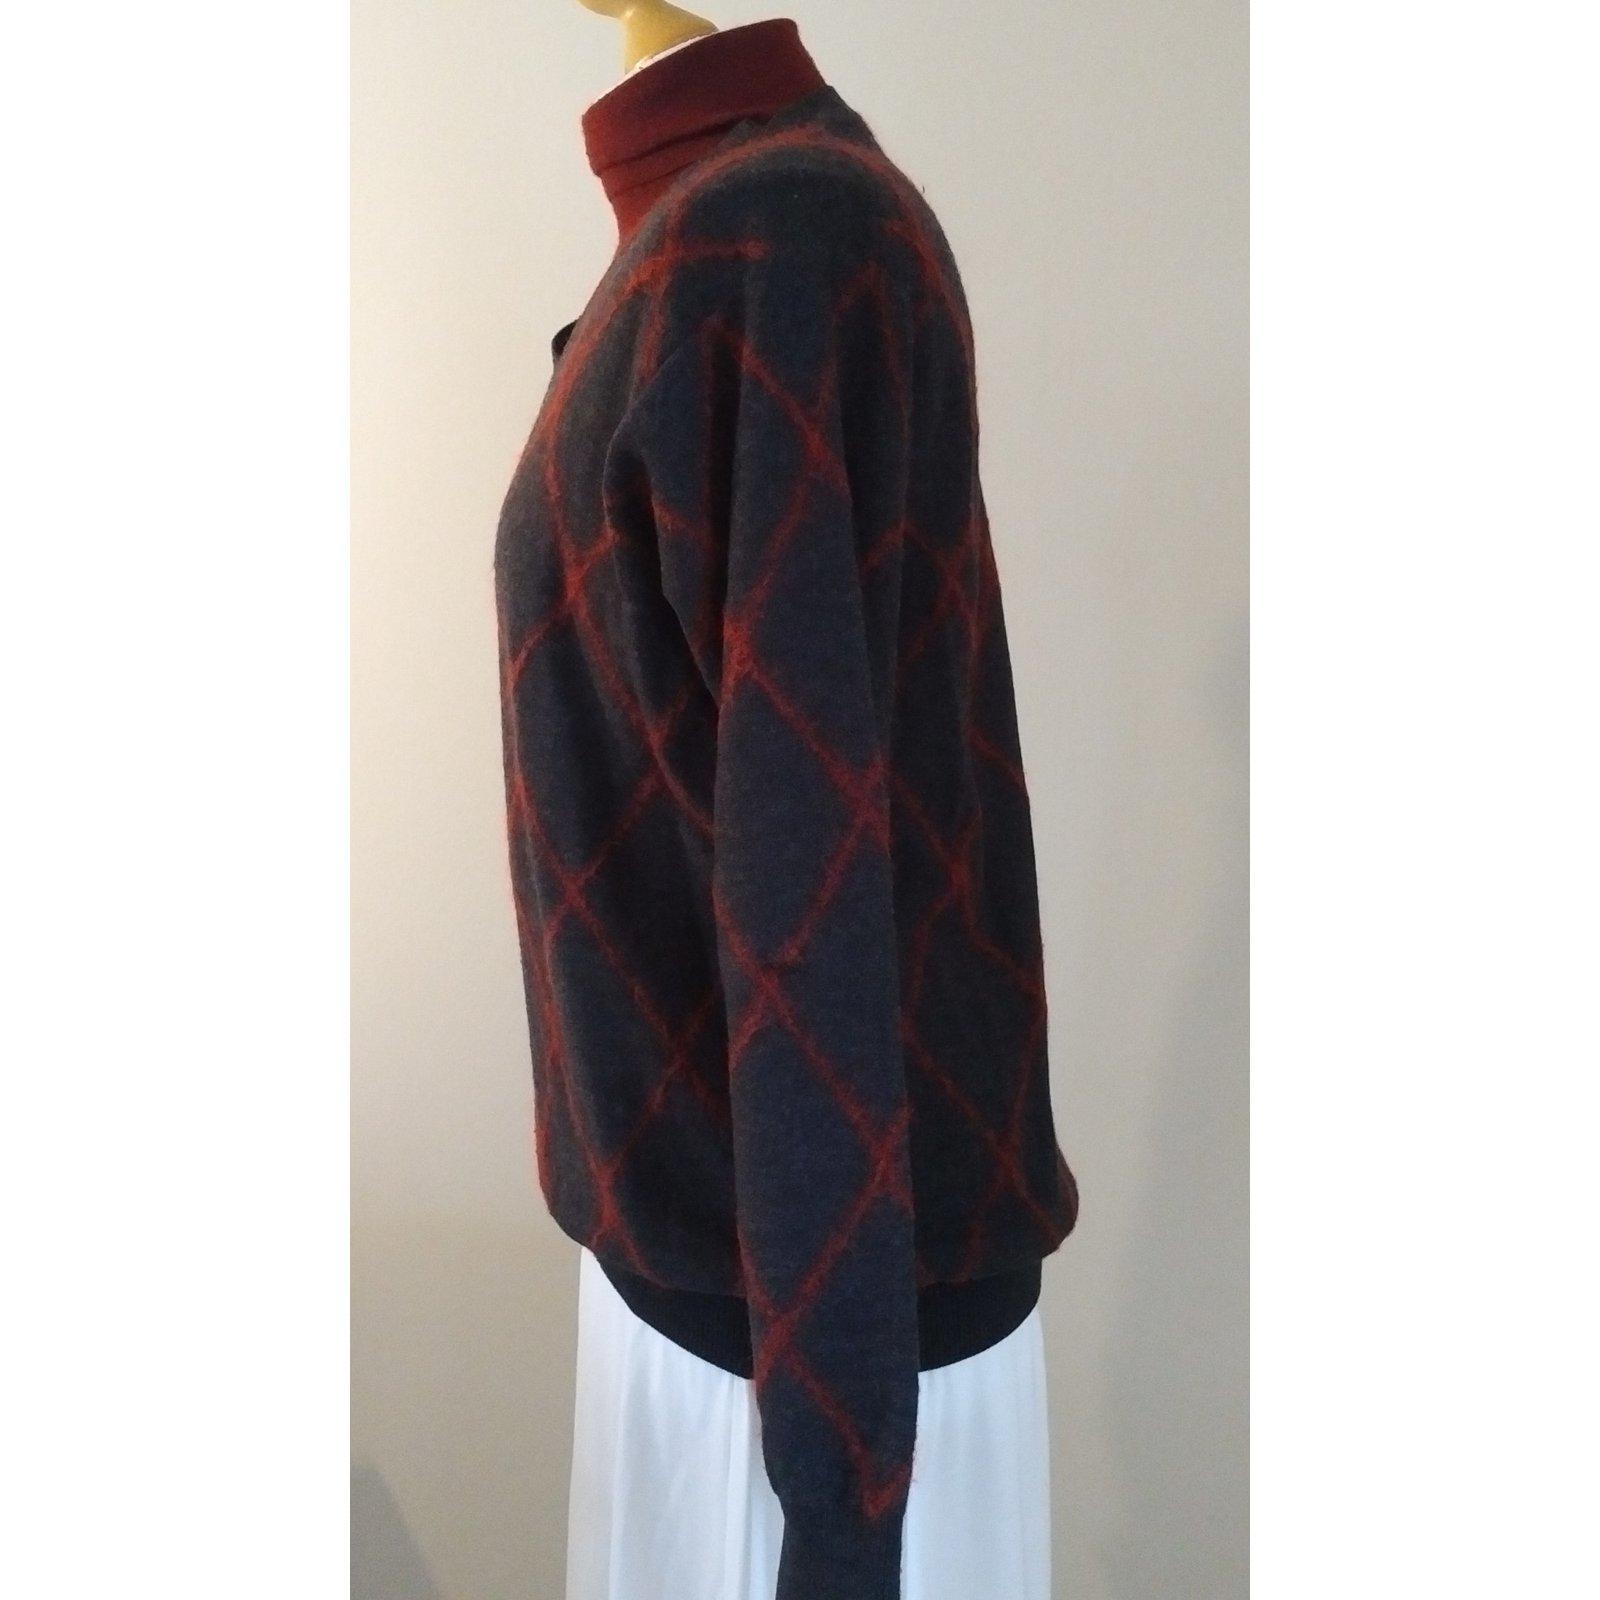 67106fc3c269d0 Pringle Of Scotland Dark Grey Pringle Argyle Knitwear Wool Dark grey  ref.105459 - Joli Closet